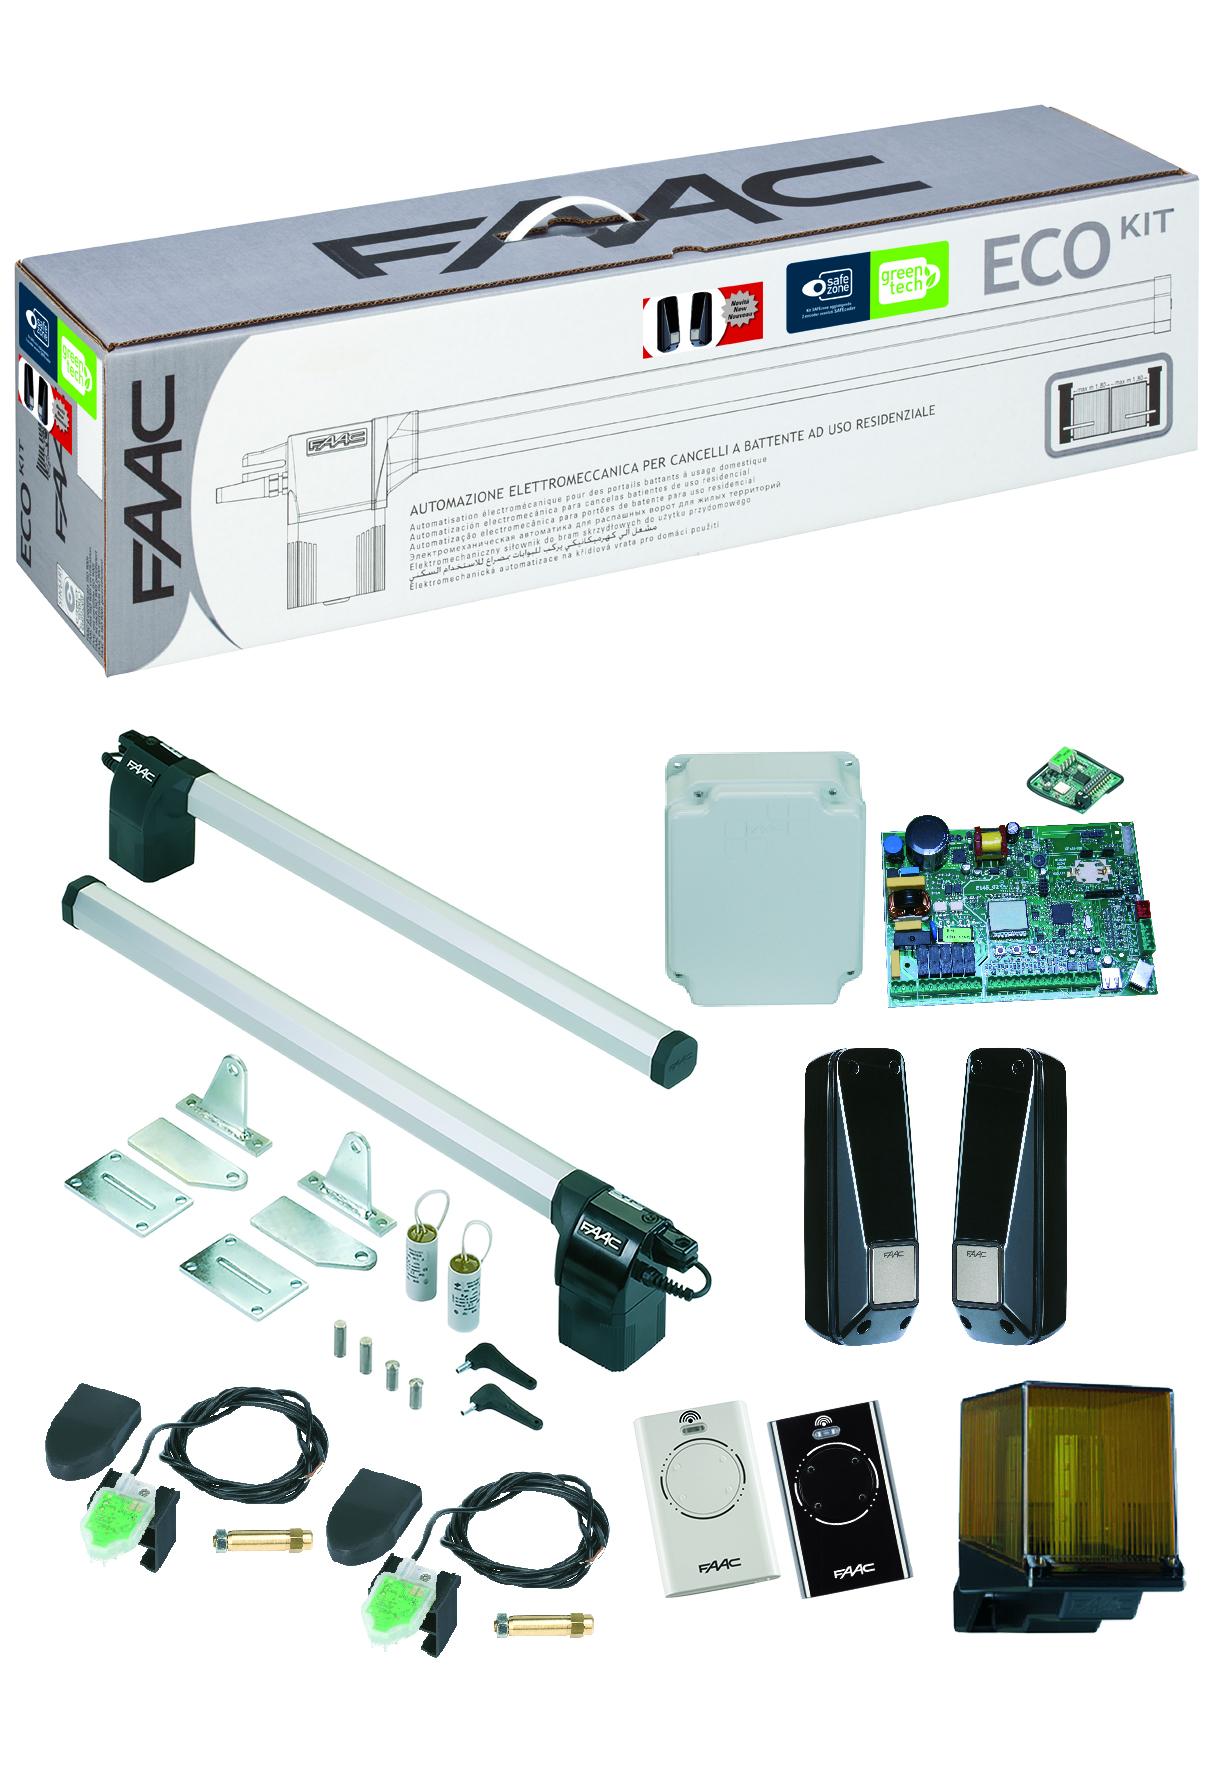 Portail electrique guide d 39 achat for Faac eco kit